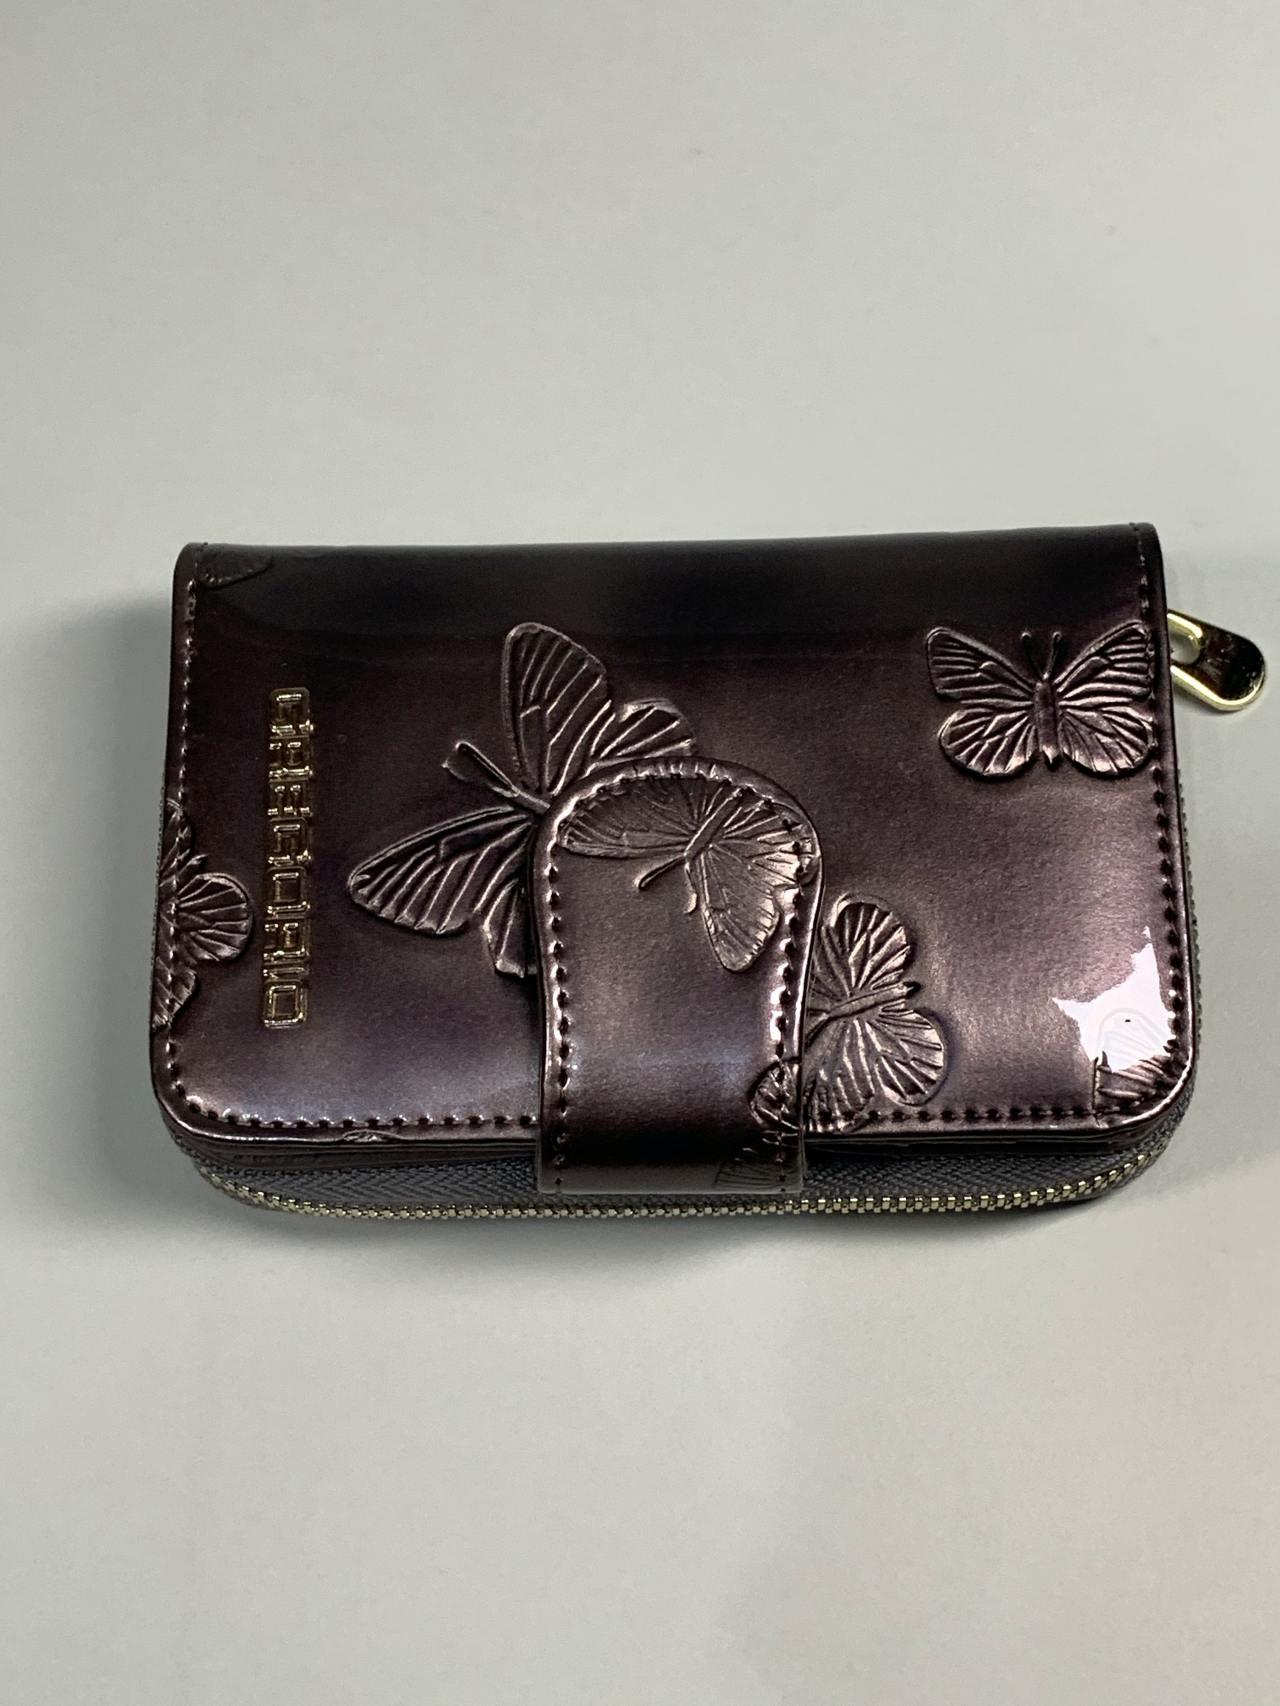 Kožená peněženka Gregorio S šedá s motýly -02